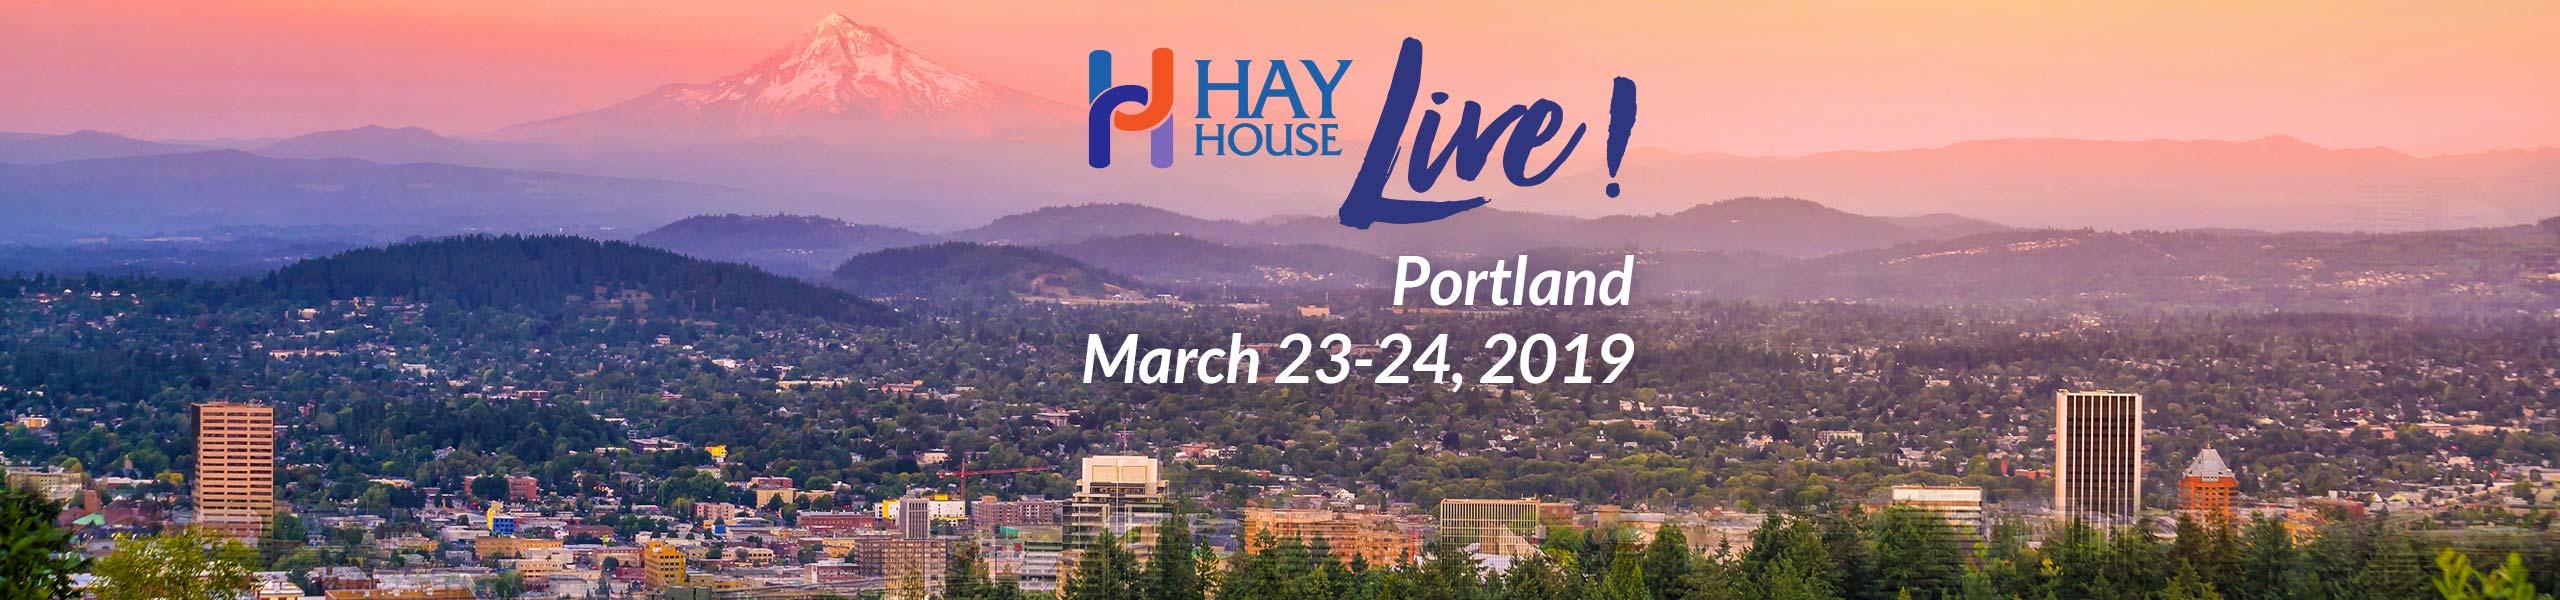 Hay House Live! Portland 2019 - Tosha Silver